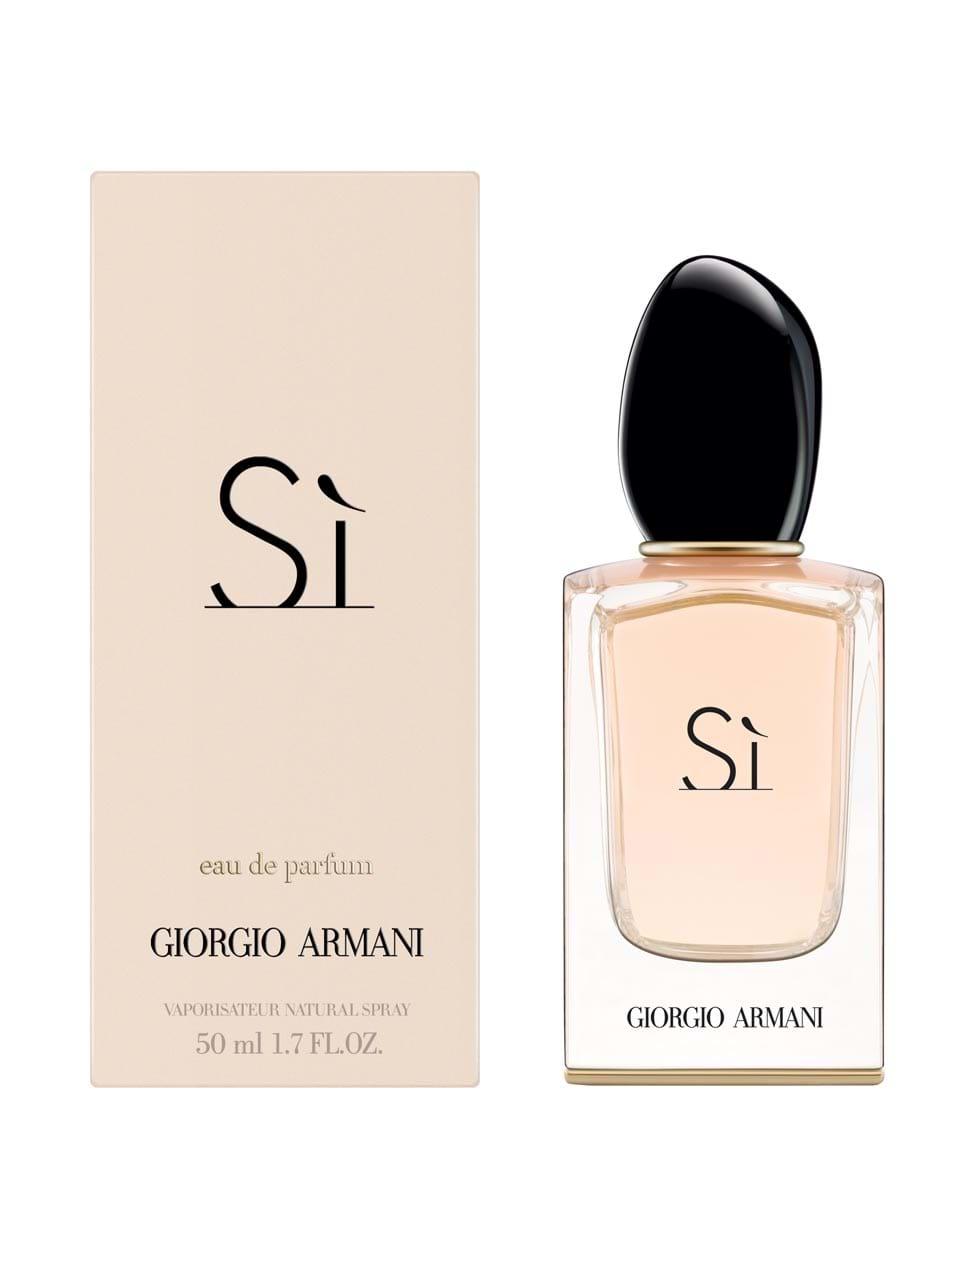 De Parfum Ml Armani 50 Giorgio Sì Eau POZkuTXi